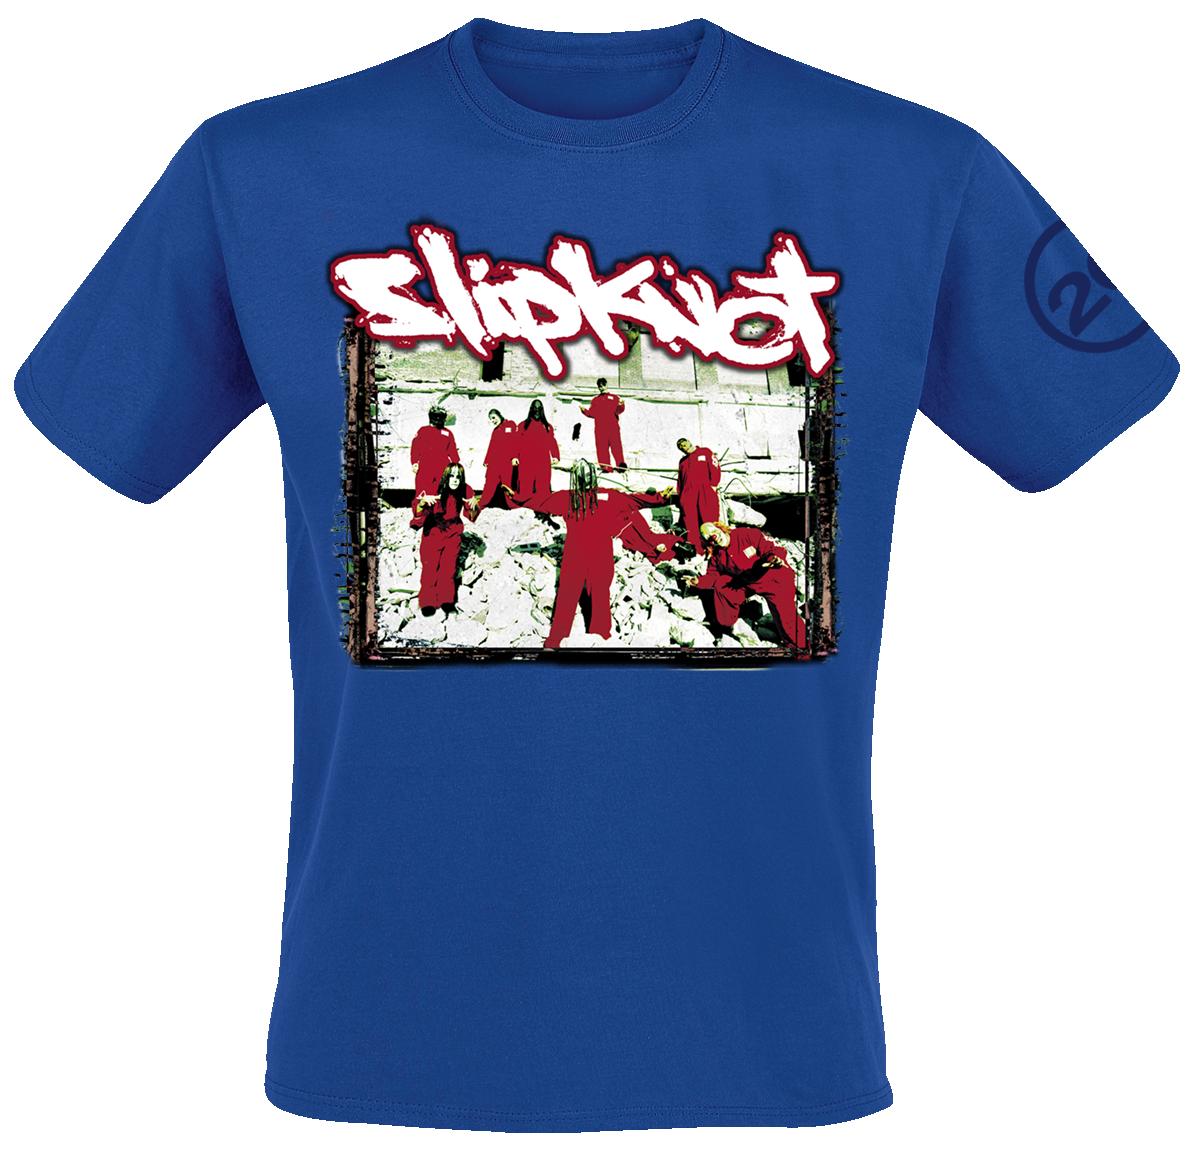 Slipknot - 20th Anniversary Red Jumpsuit - T-Shirt - navy image